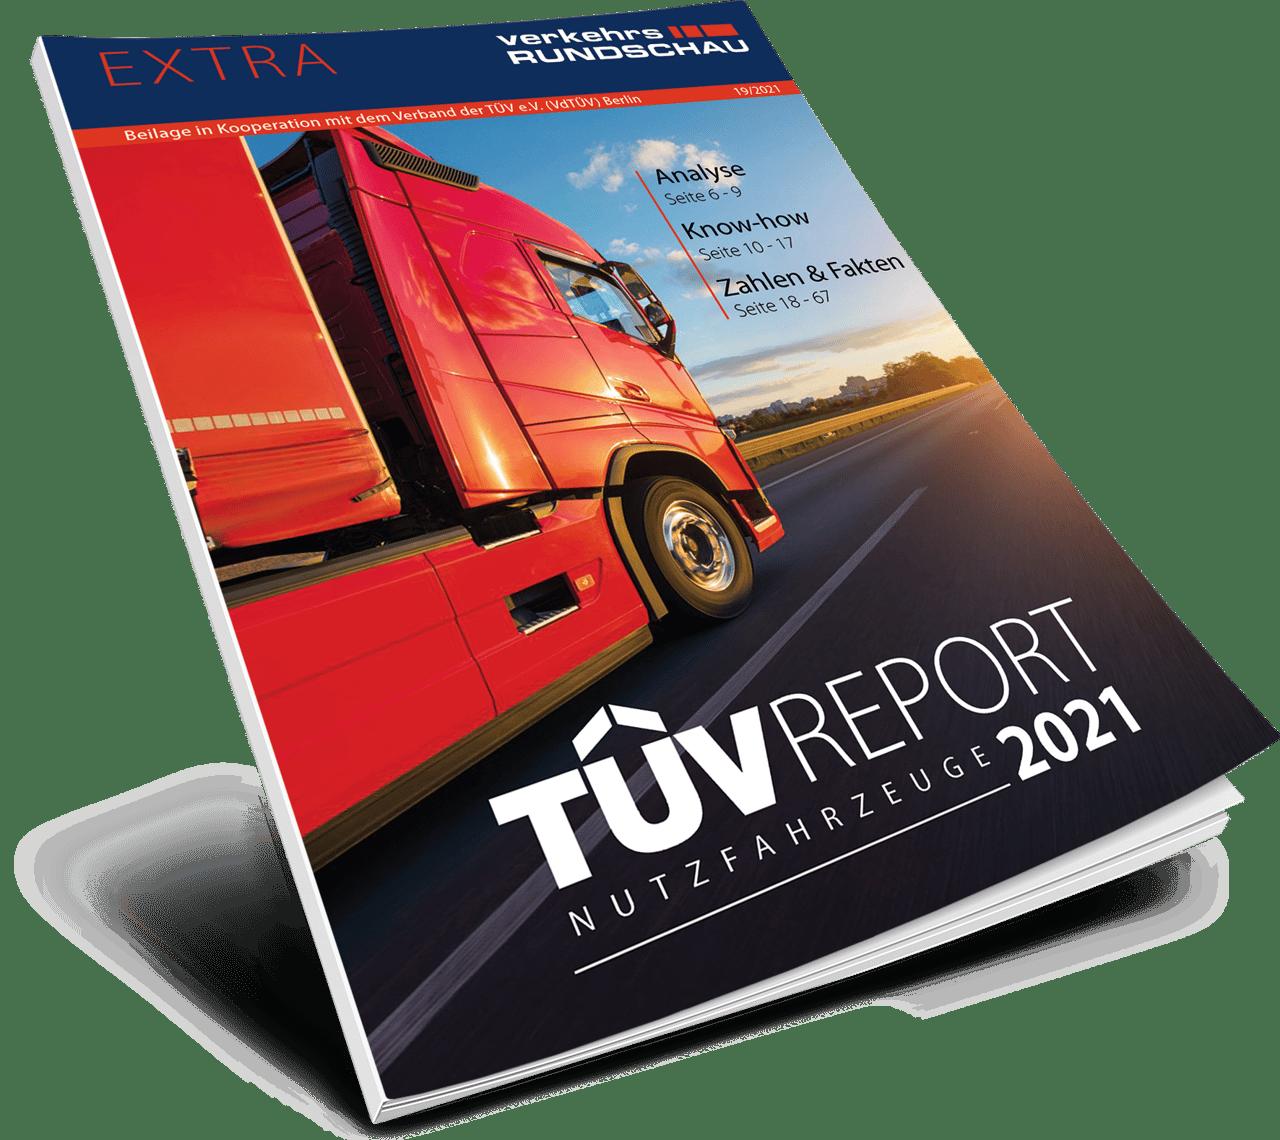 Automotive lighting, Motor vehicle, Hood, Car, Tire, Publication, Font